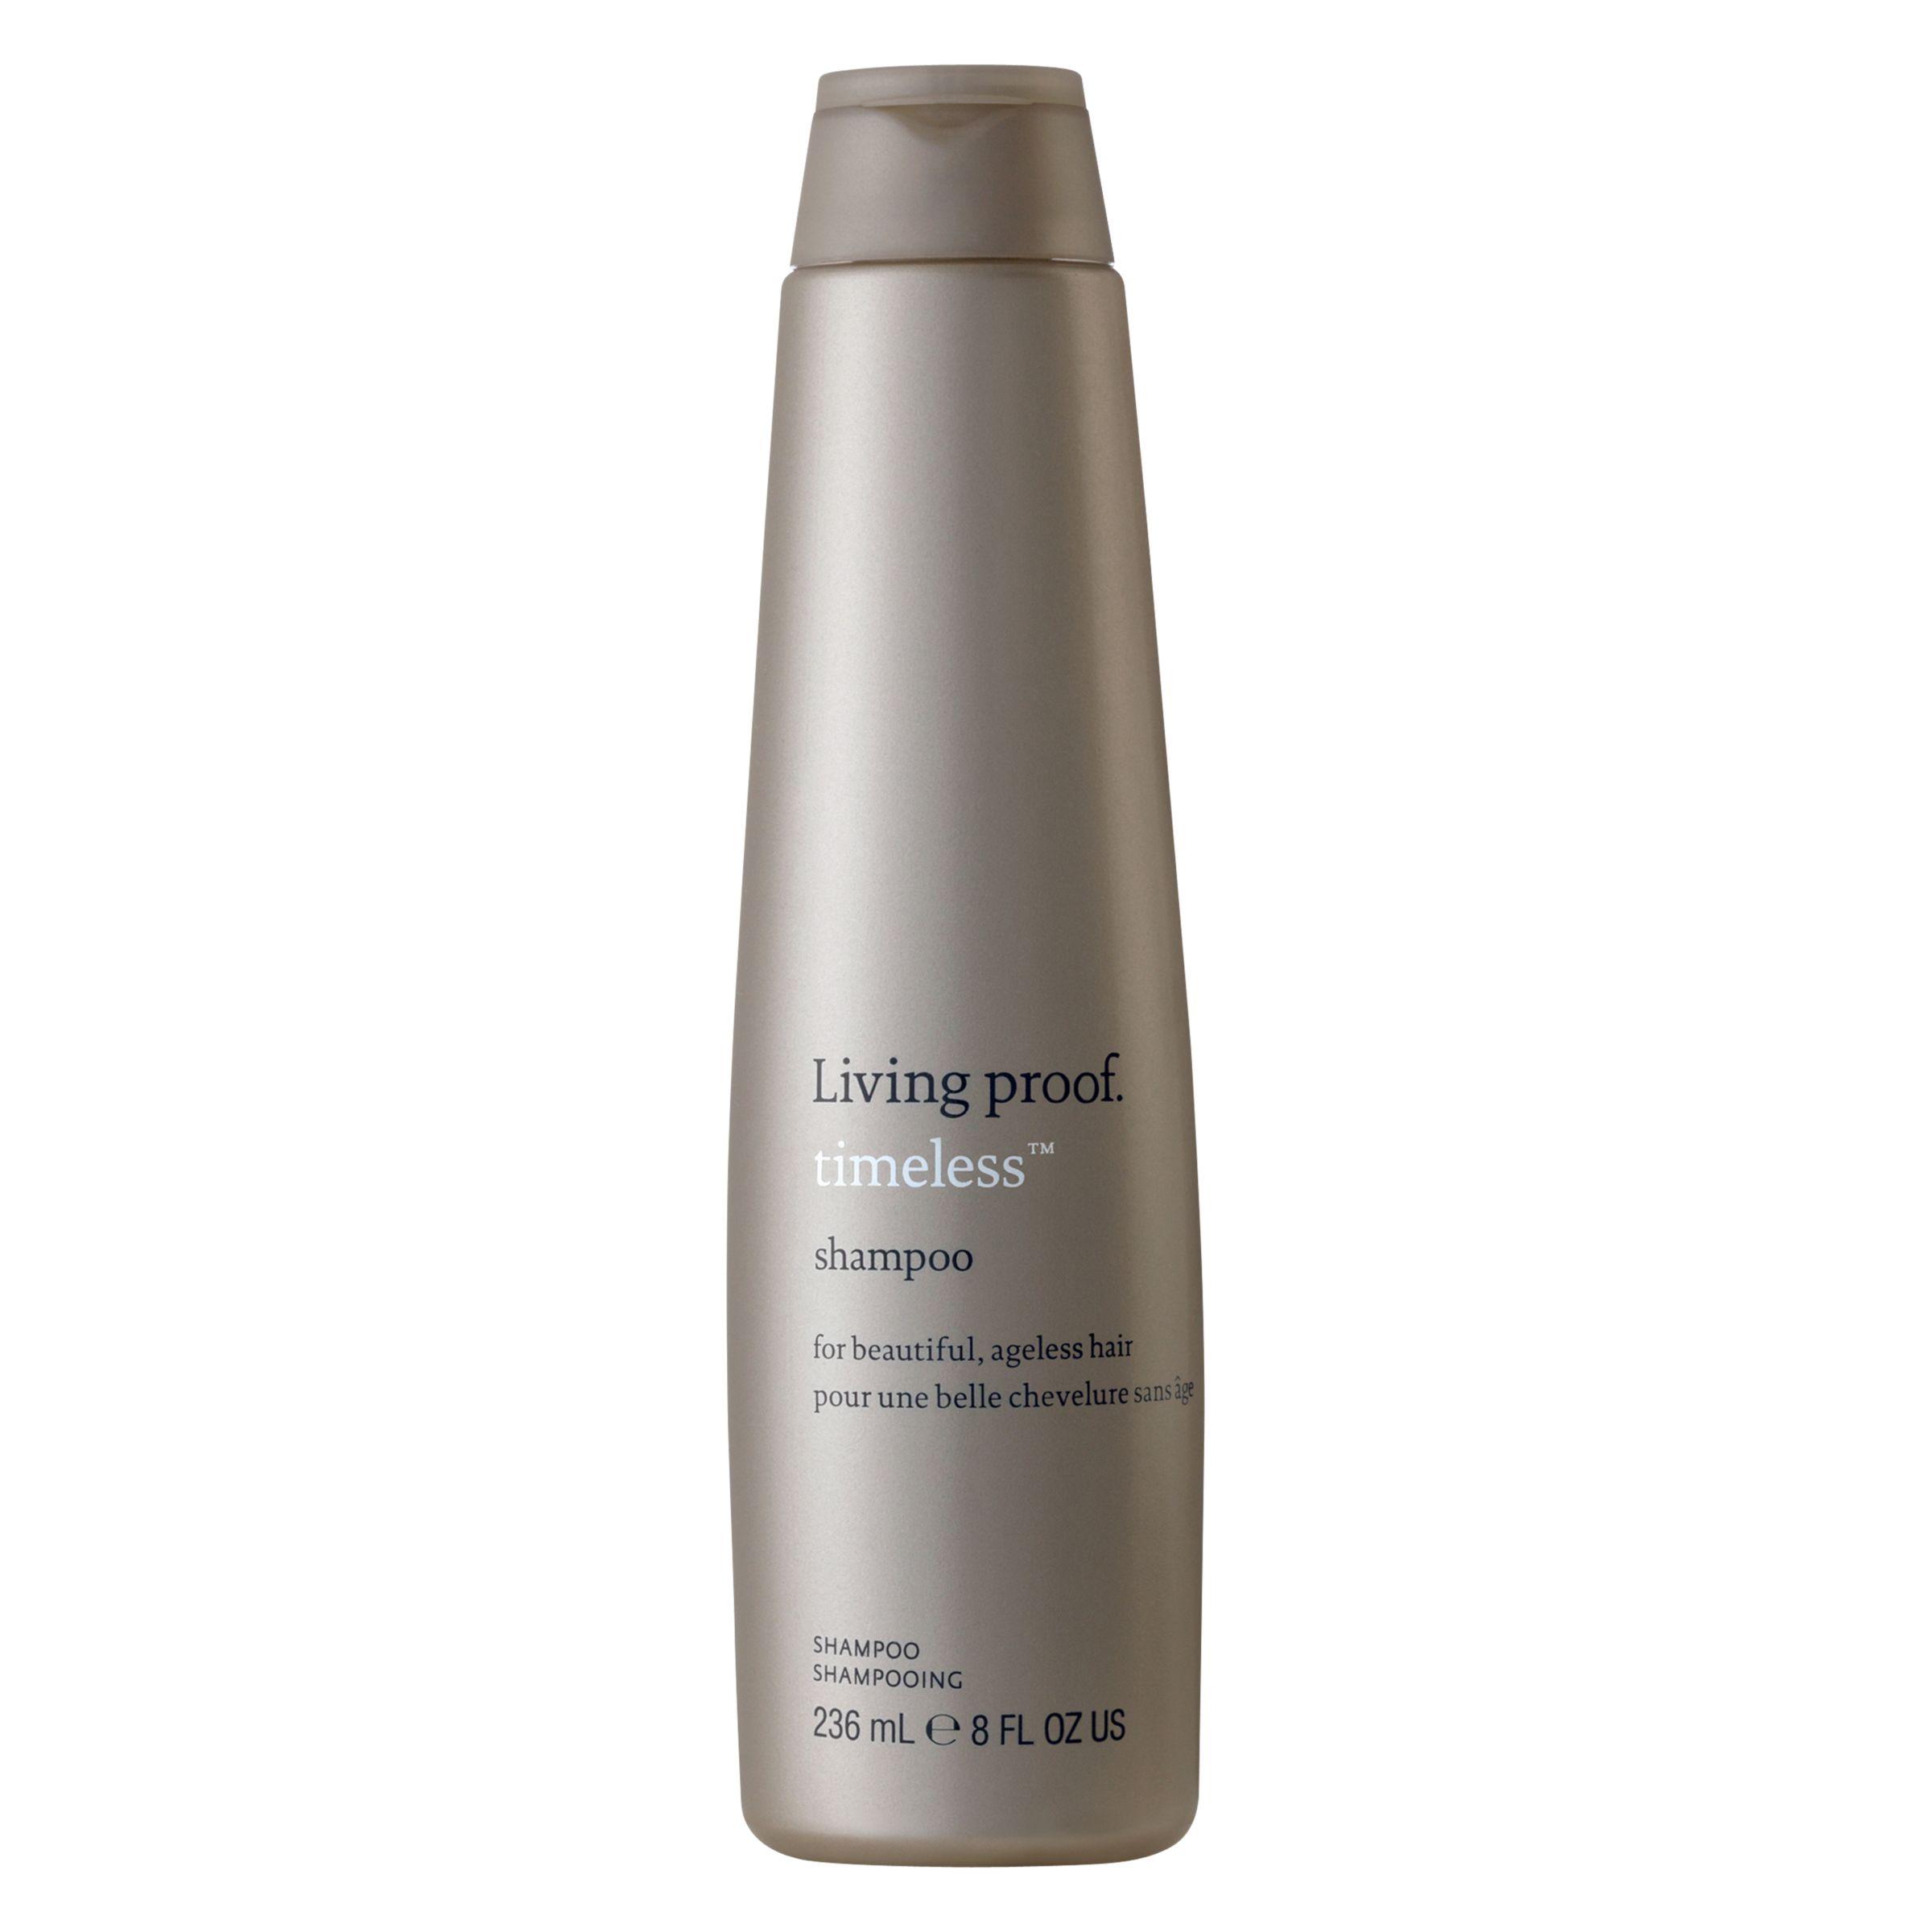 Living Proof Living Proof Timeless Shampoo, 236ml